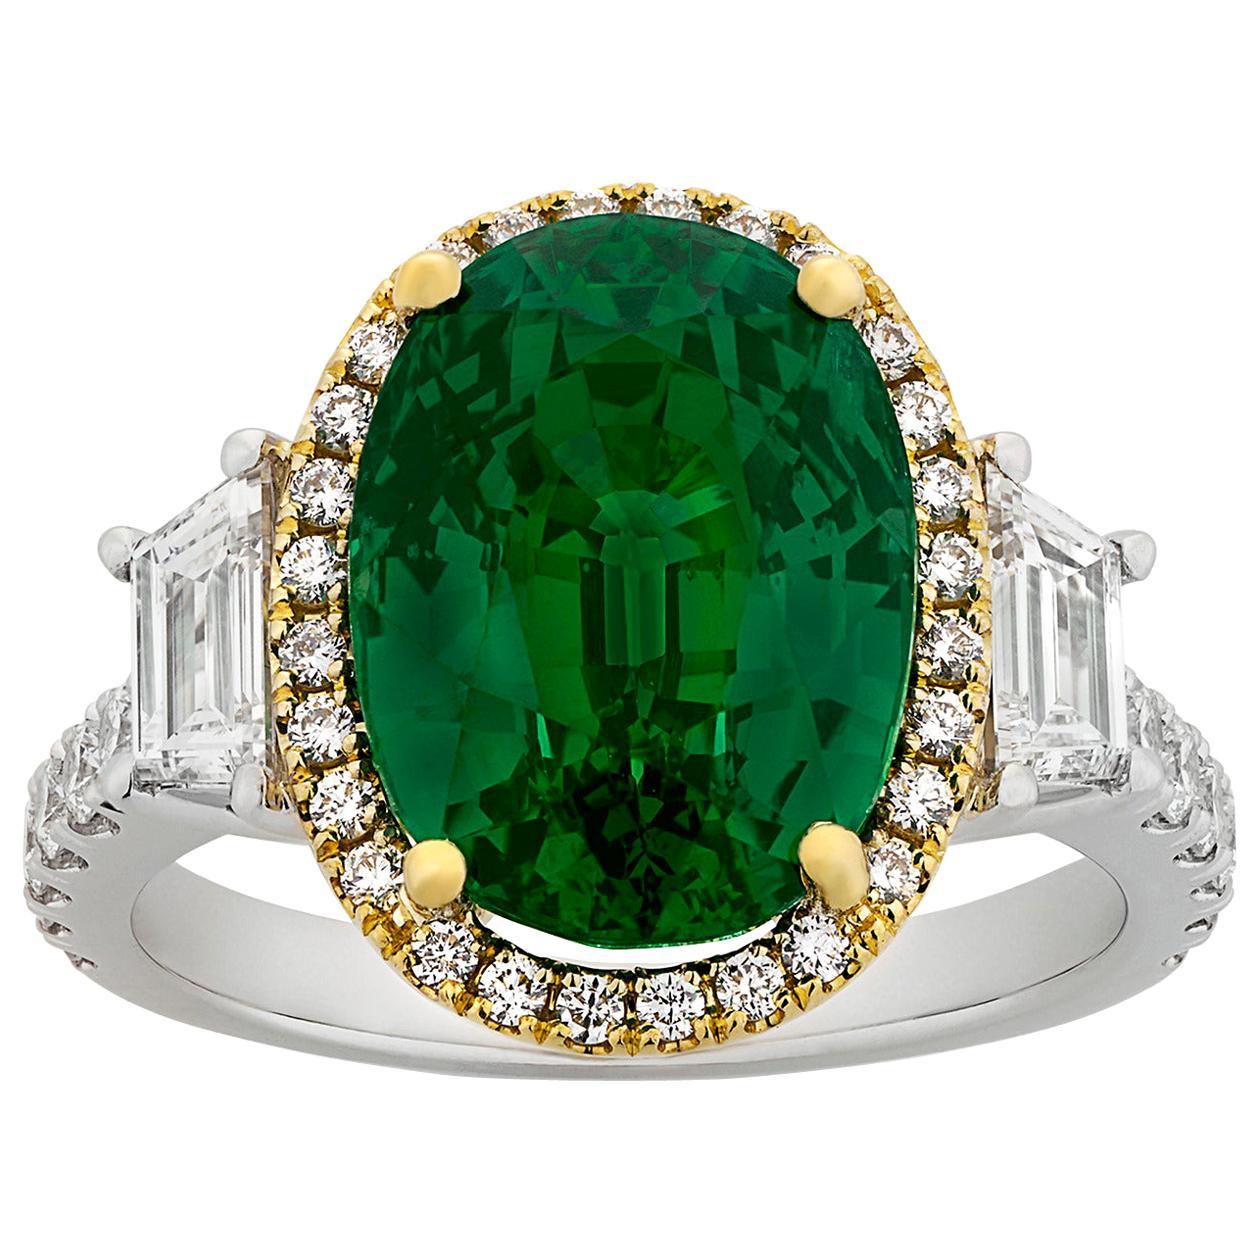 Art Deco Untreated Tsavorite Garnet Ring, 7.88 Carat